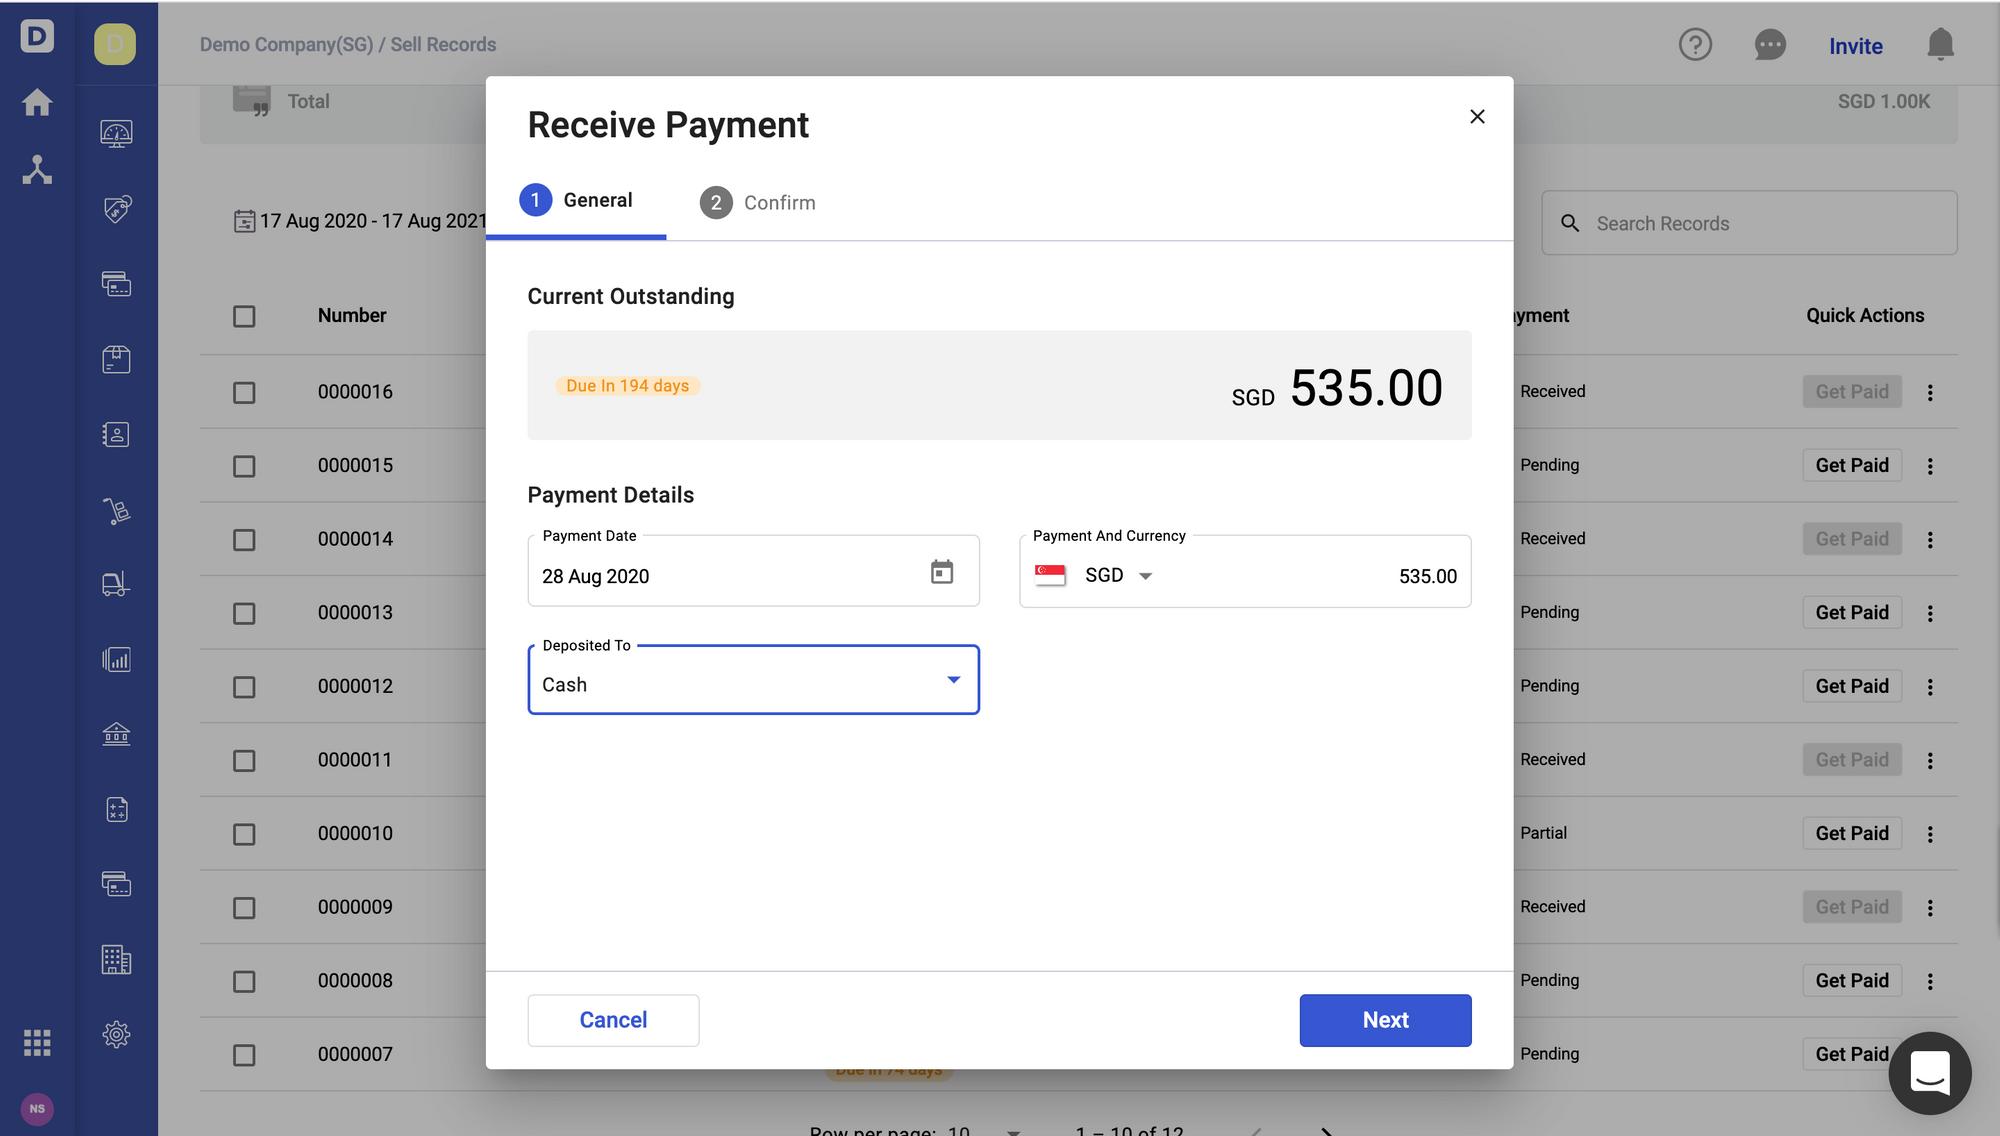 Deskera Books- Receive Payment